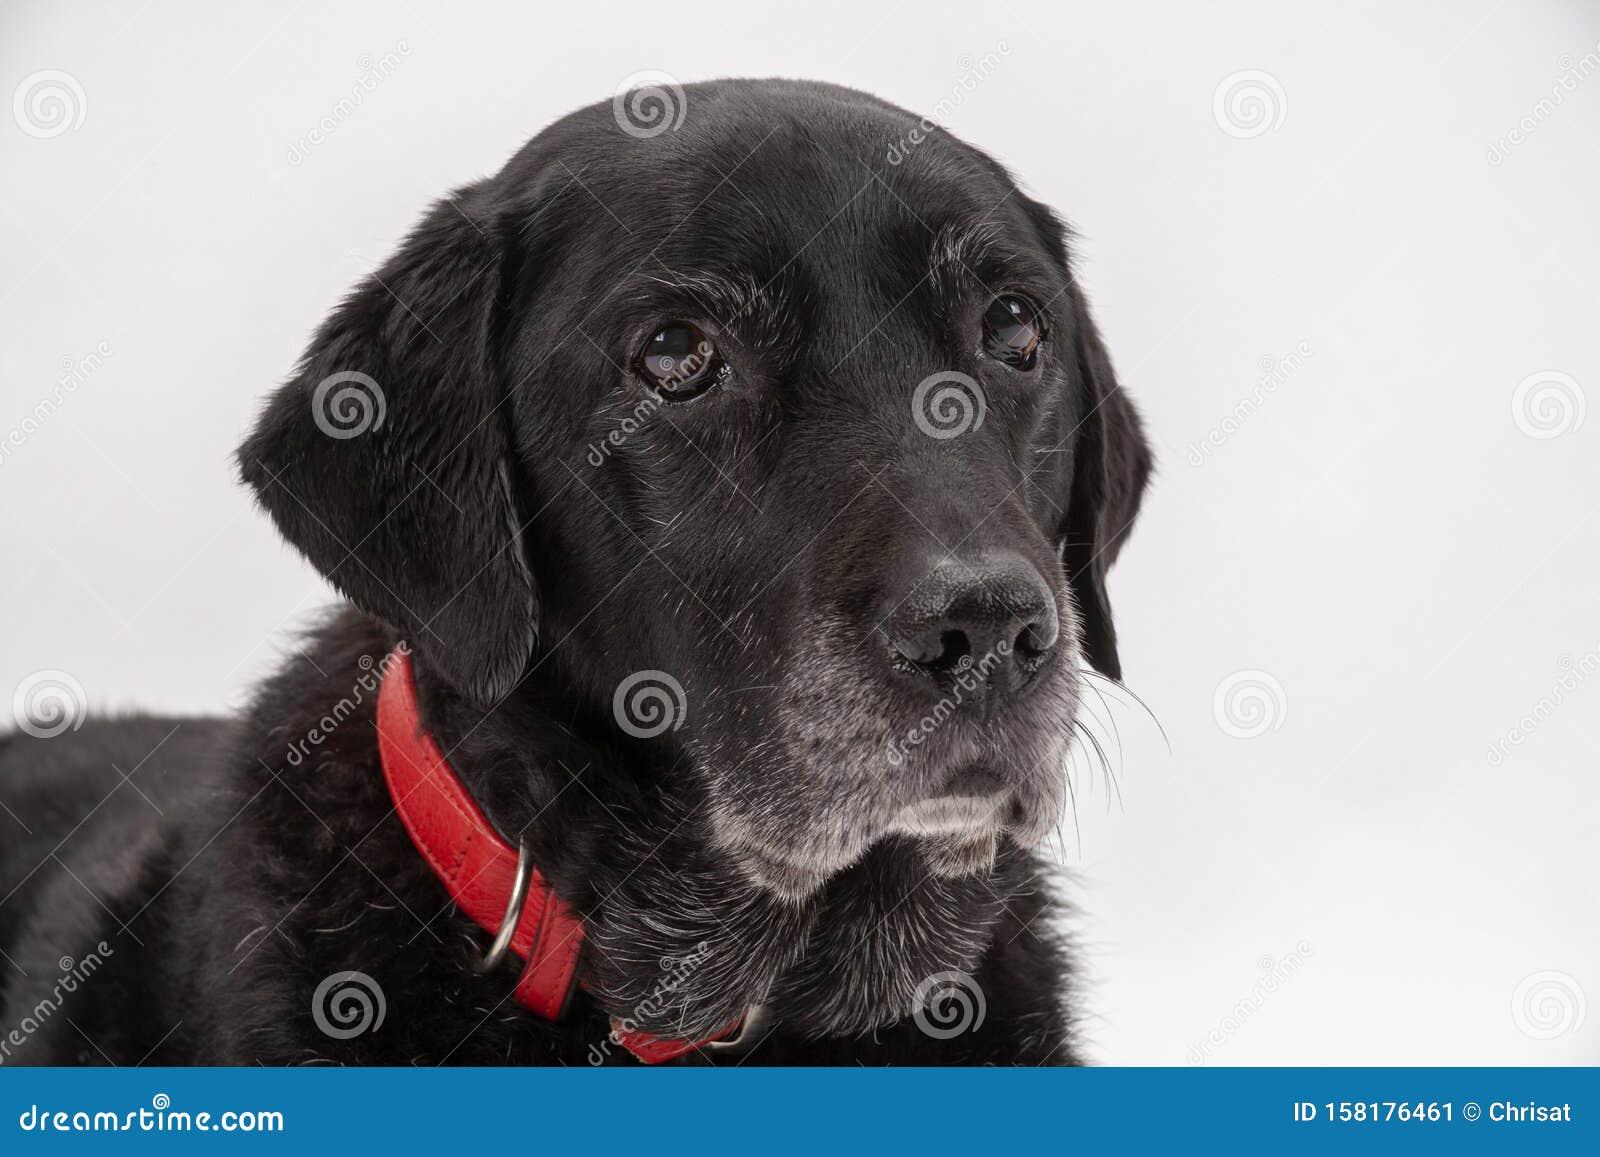 An elderly black labrador poses on a white seamless backdrop